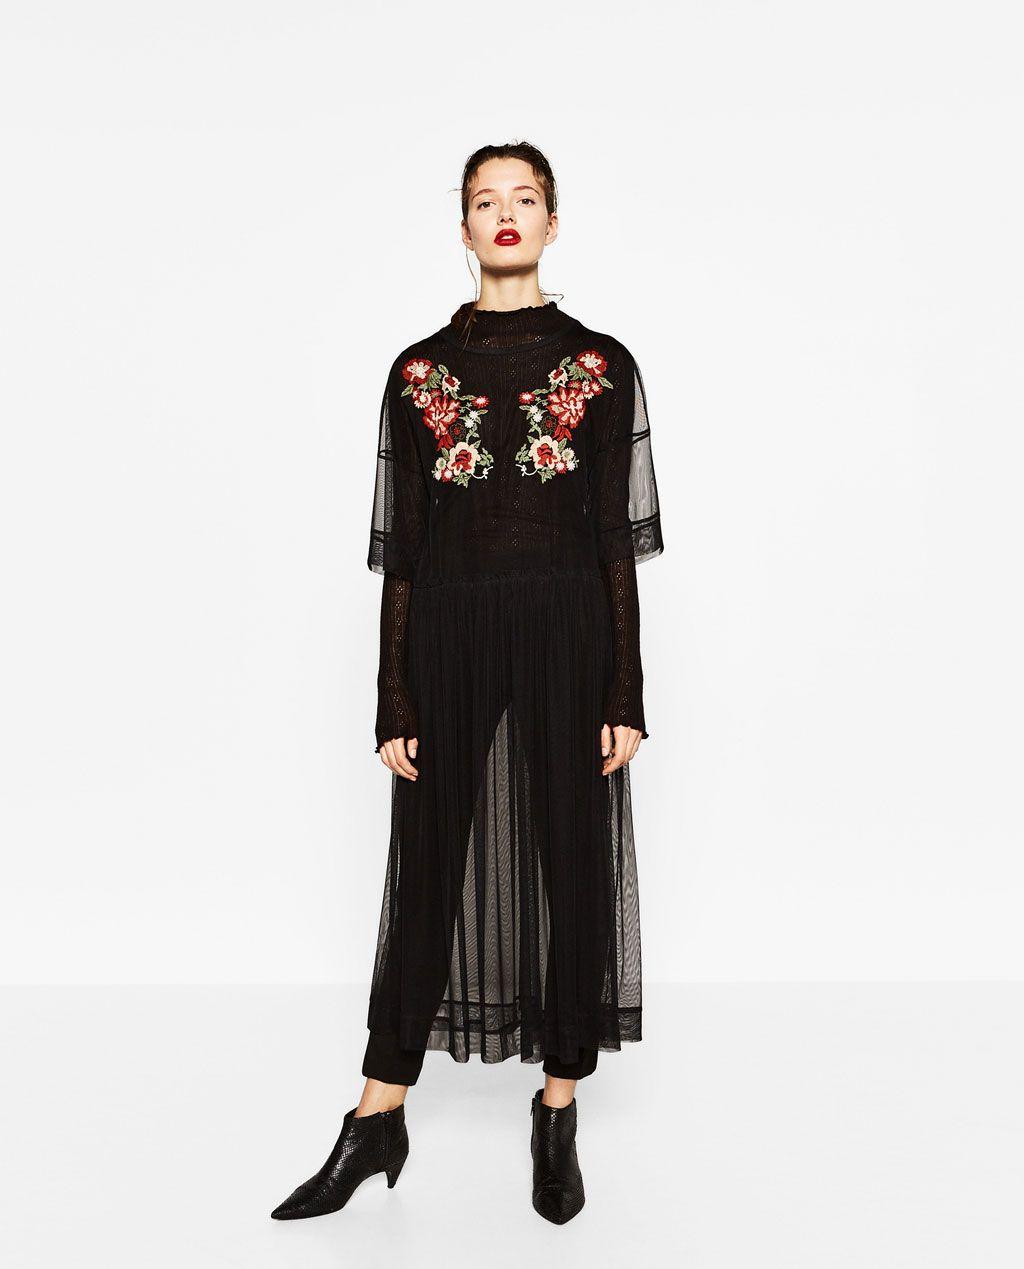 Image 1 Of Embroidered Tulle Dress From Zara Modestil Netzkleid Kleidung